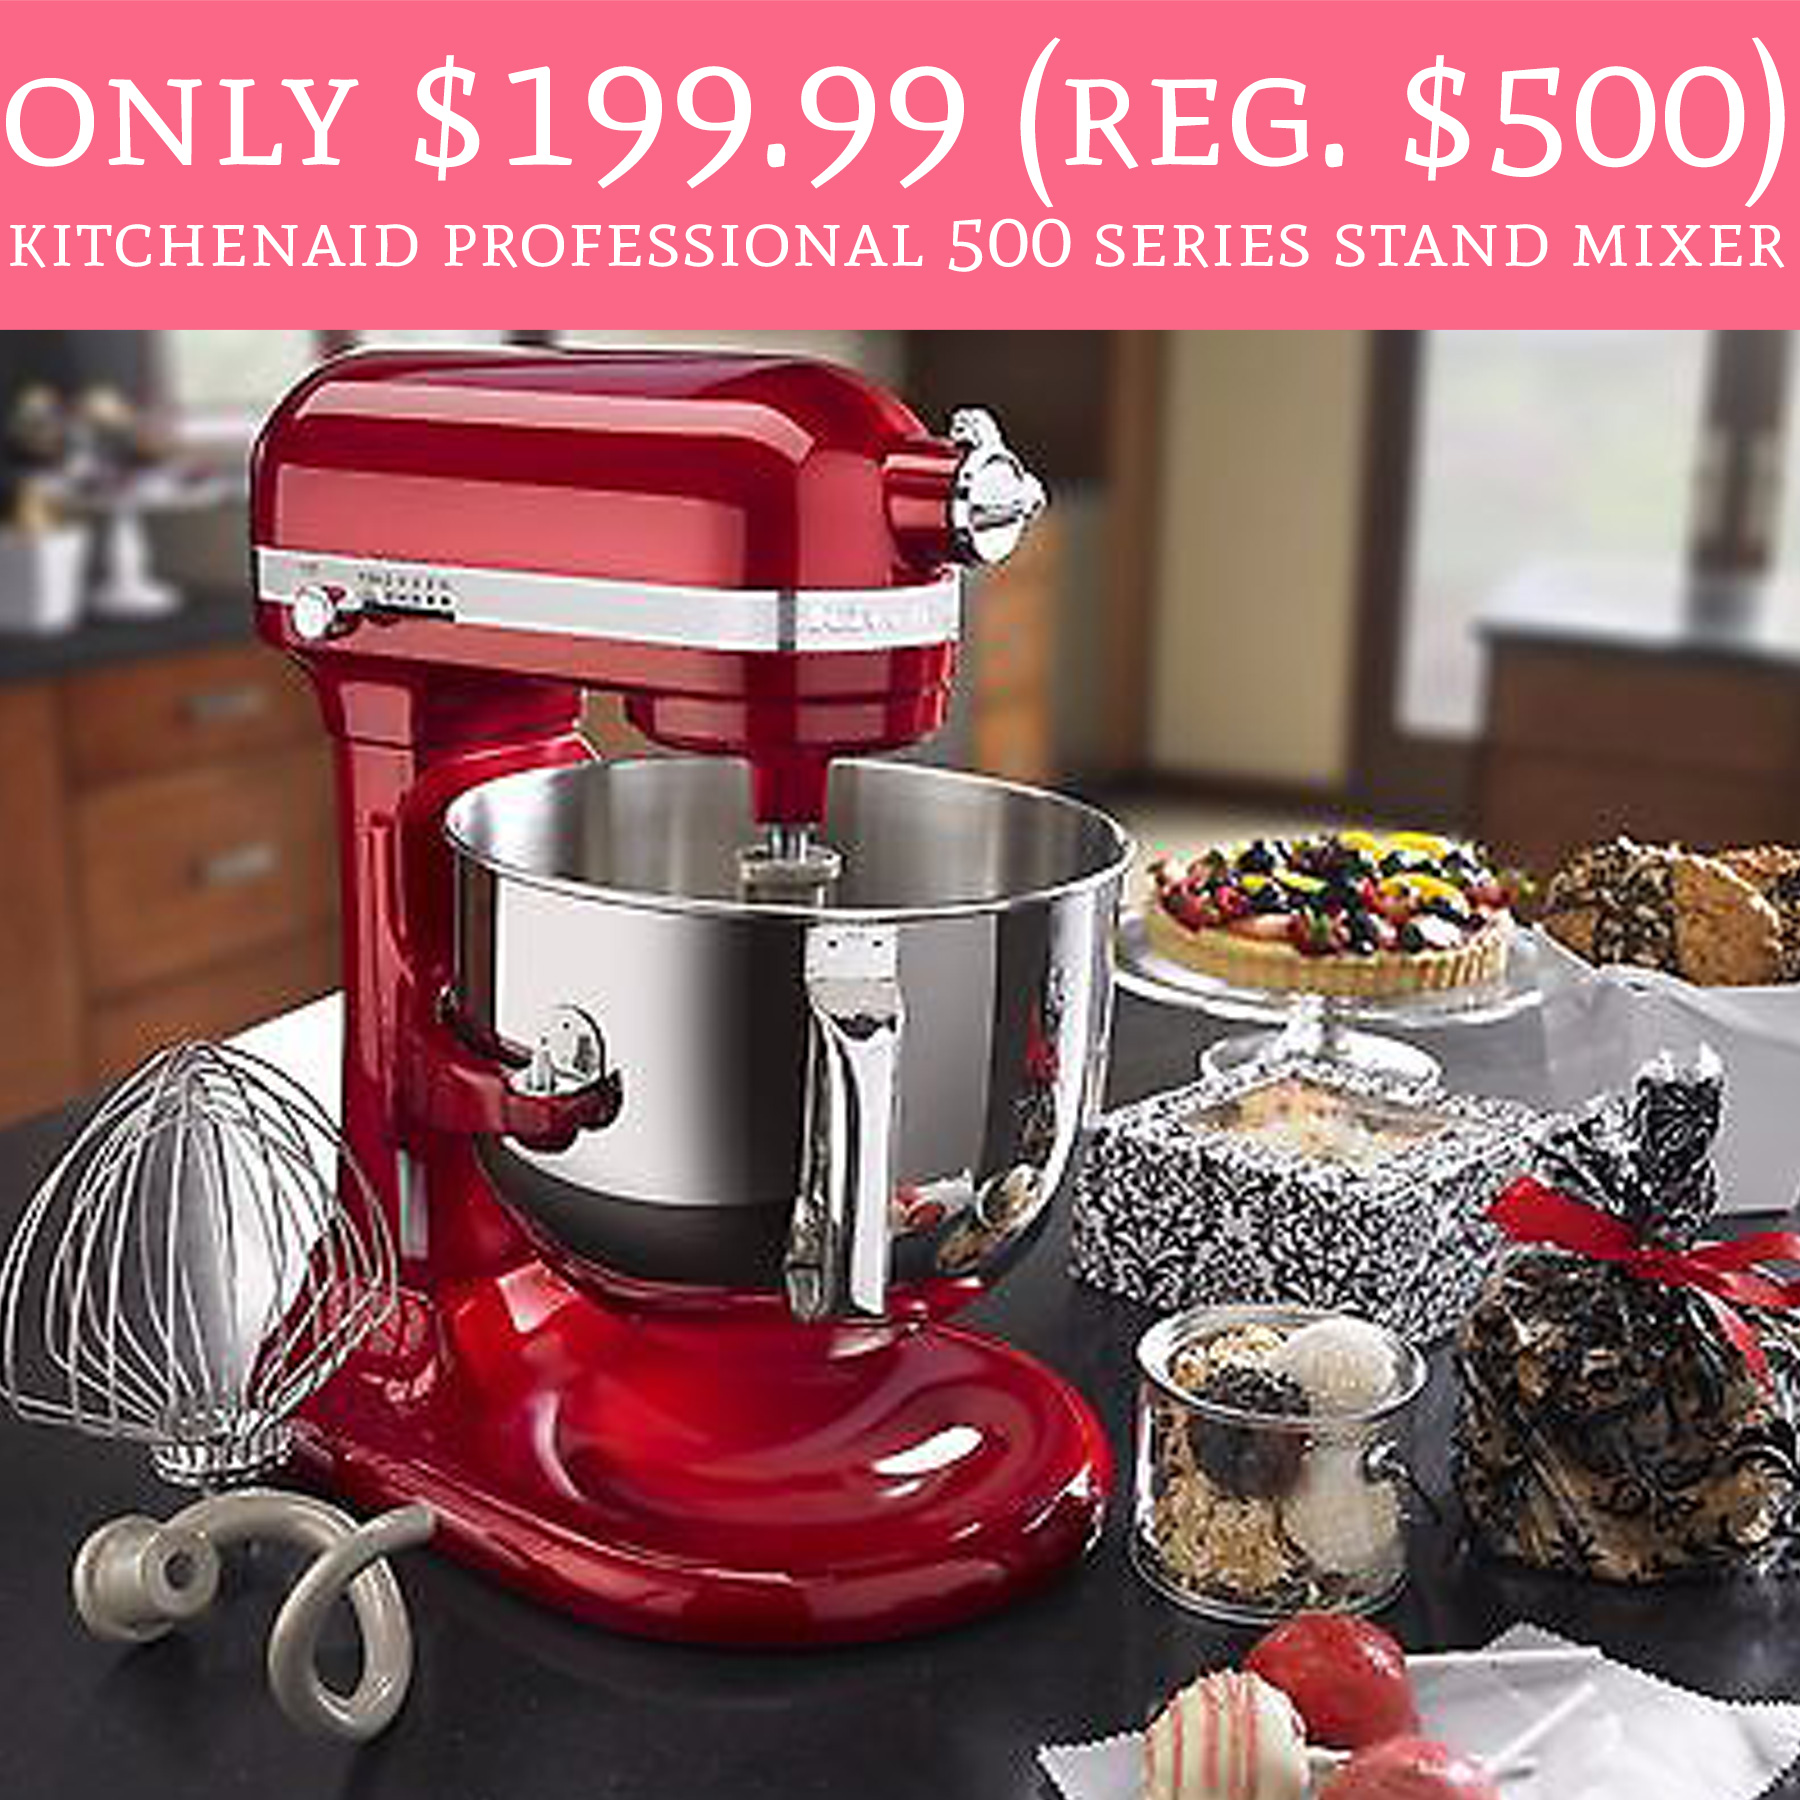 kitchen aid pro 500 new appliances only 199 99 regular kitchenaid professional